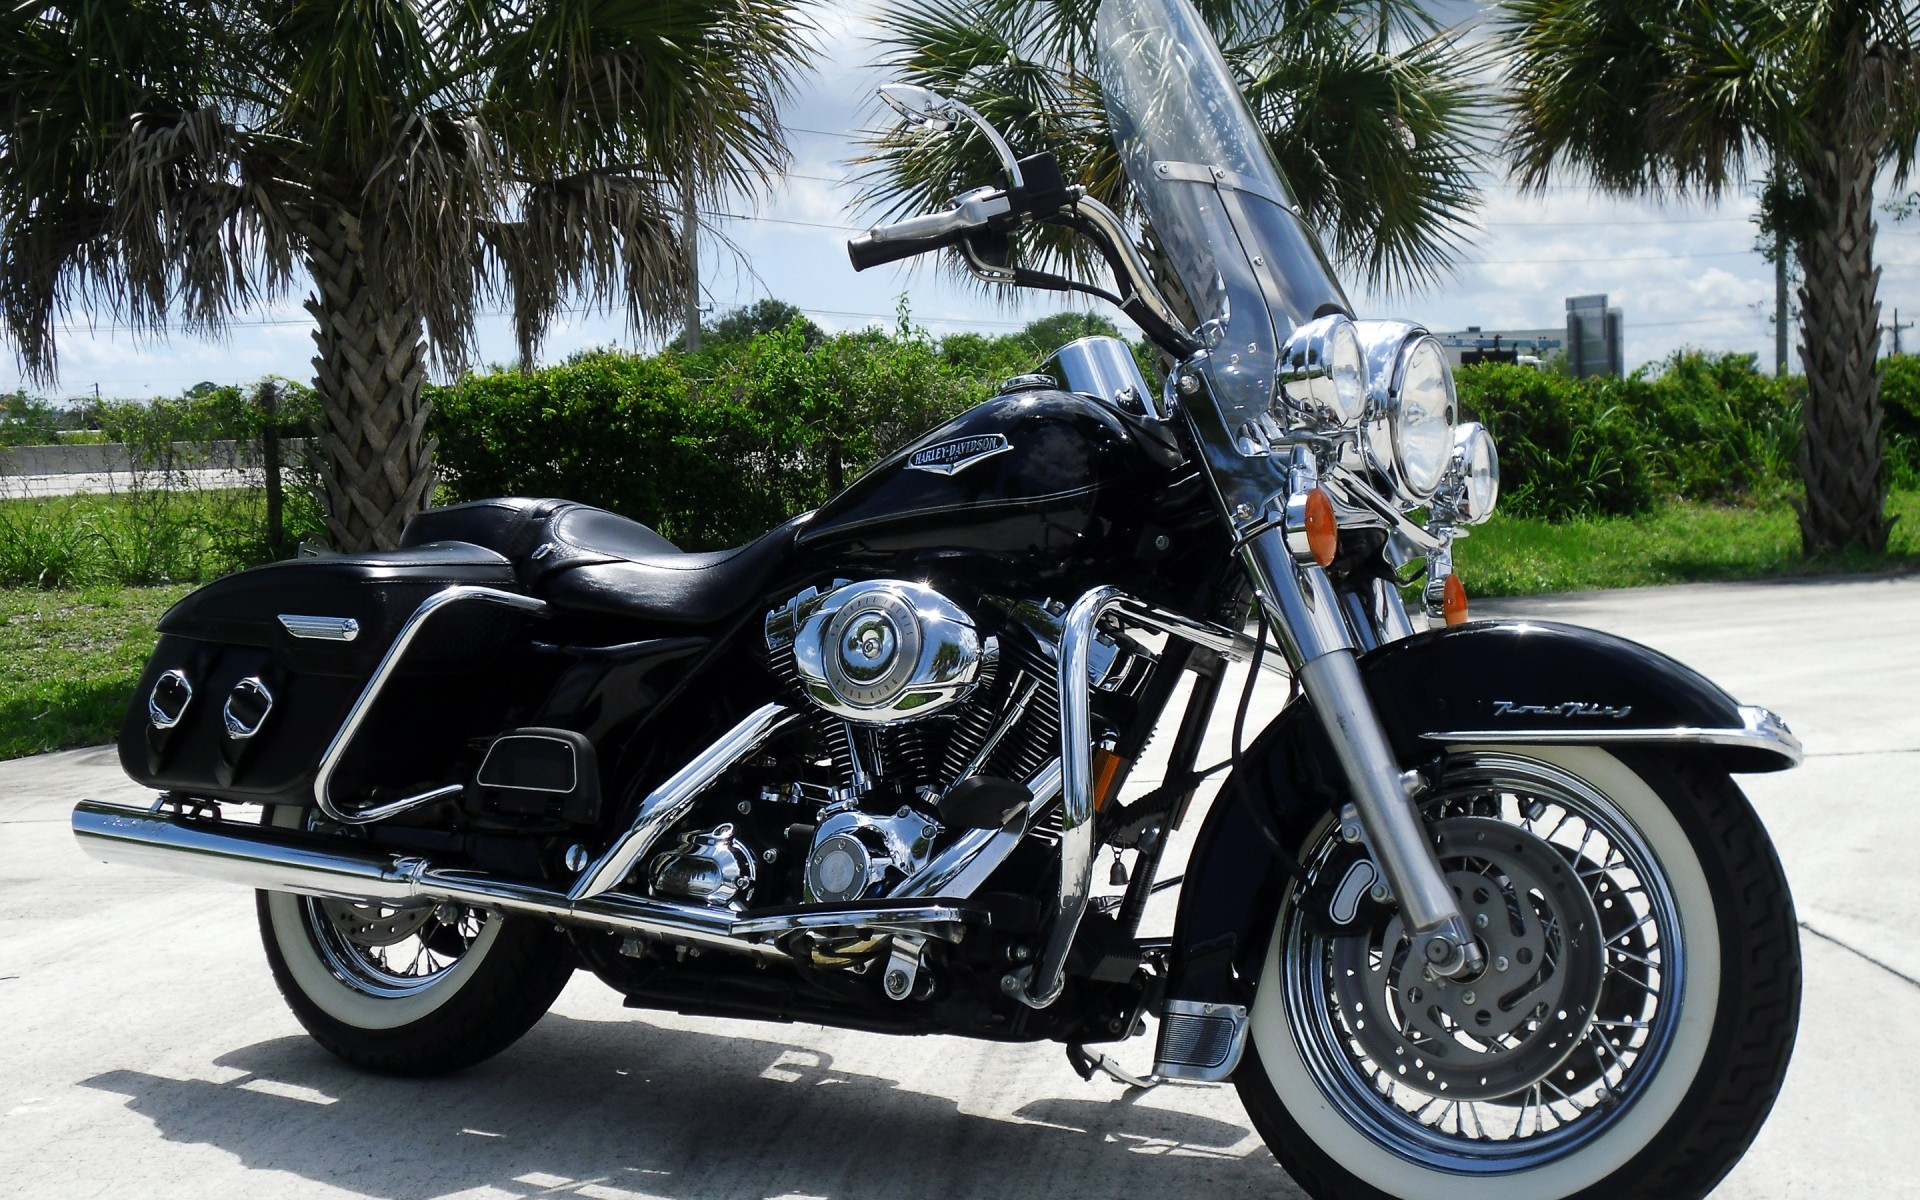 Обои Мотоцикл, Harley davidson, Пейзаж. Мотоциклы foto 15